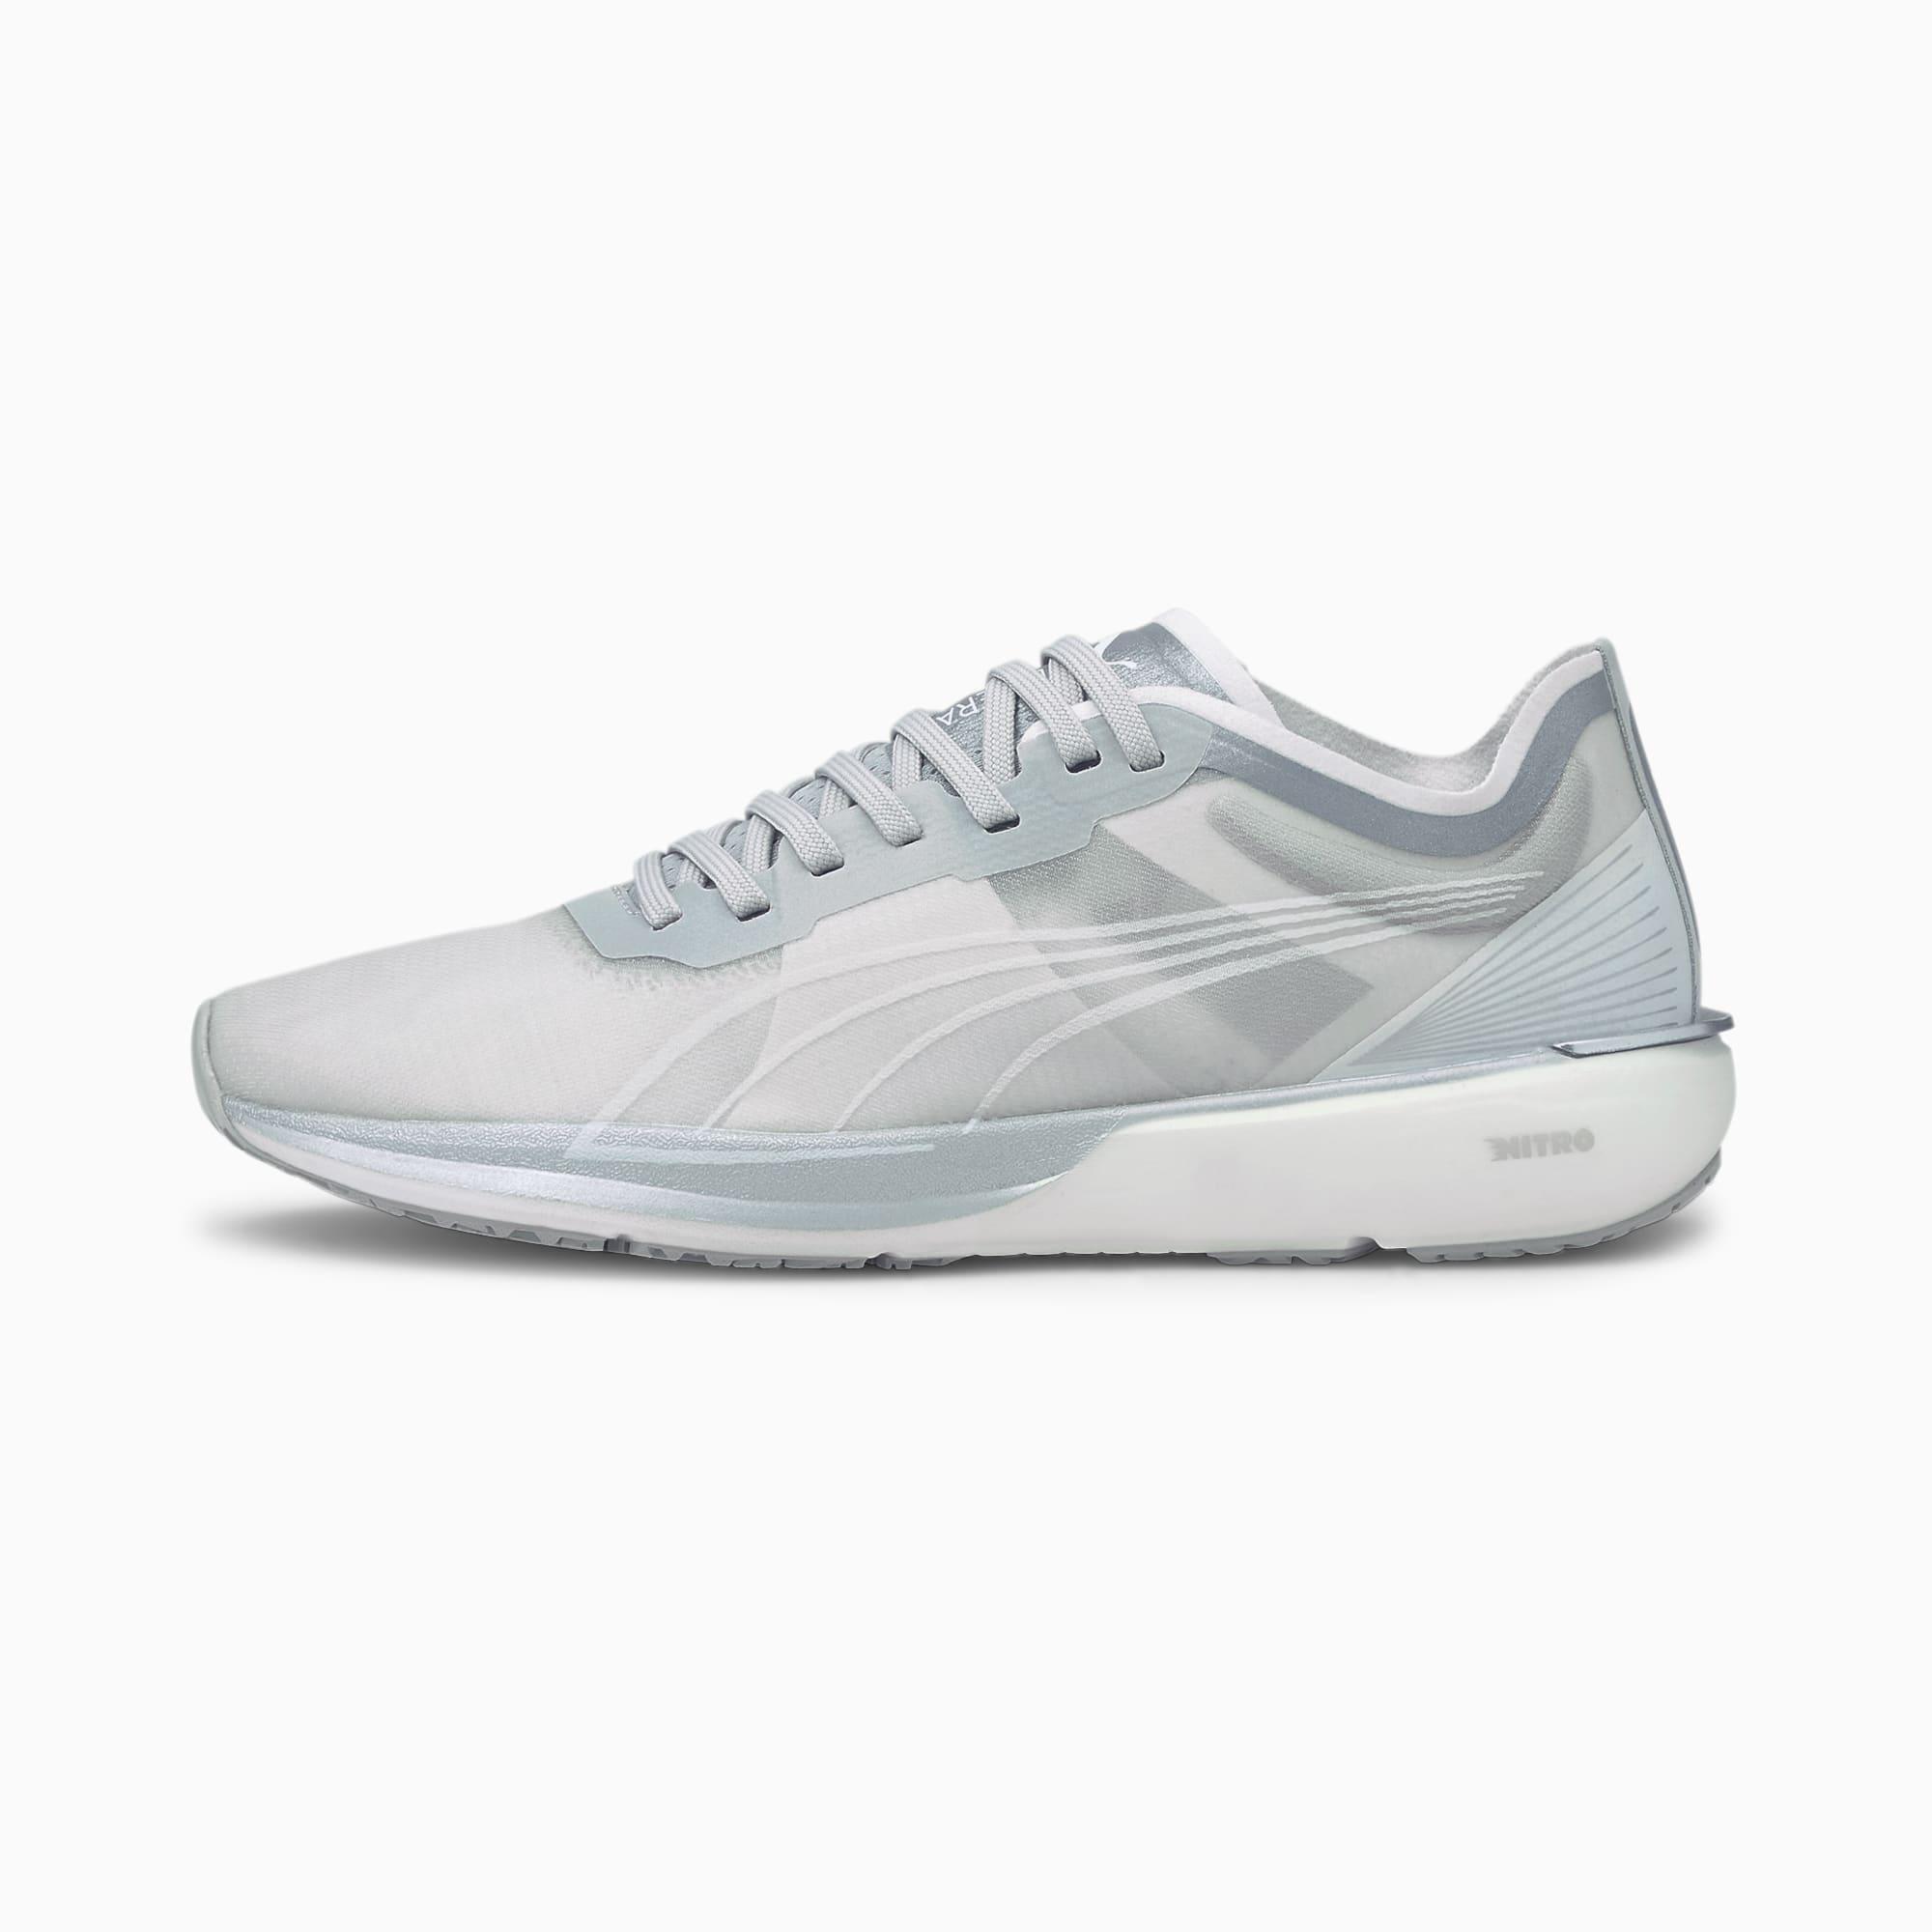 Zapatillas de Running Para Mujer Liberate Nitro Cooladapt, Plateado/Gris/Blanco, Talla 40   PUMA Mujeres